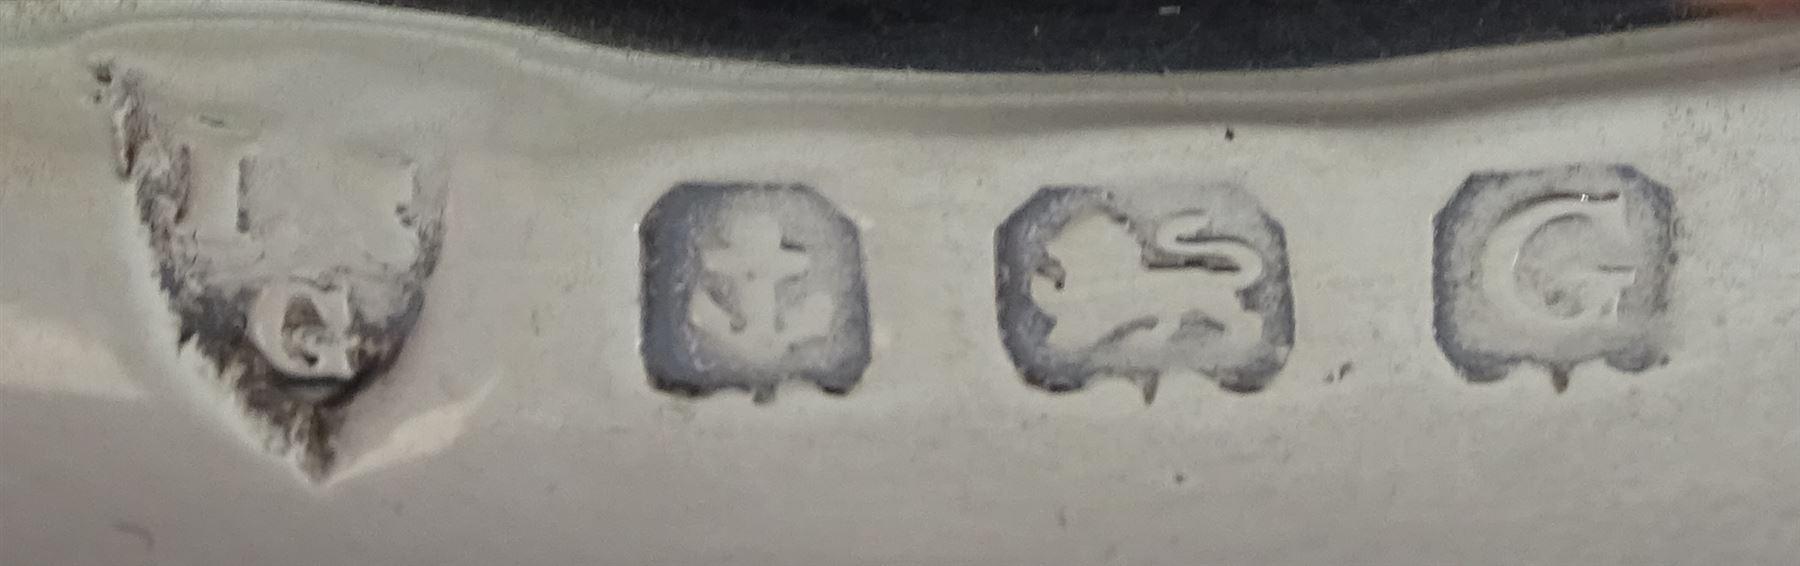 Three piece cruet set by I S Greenberg & Co - Image 2 of 4